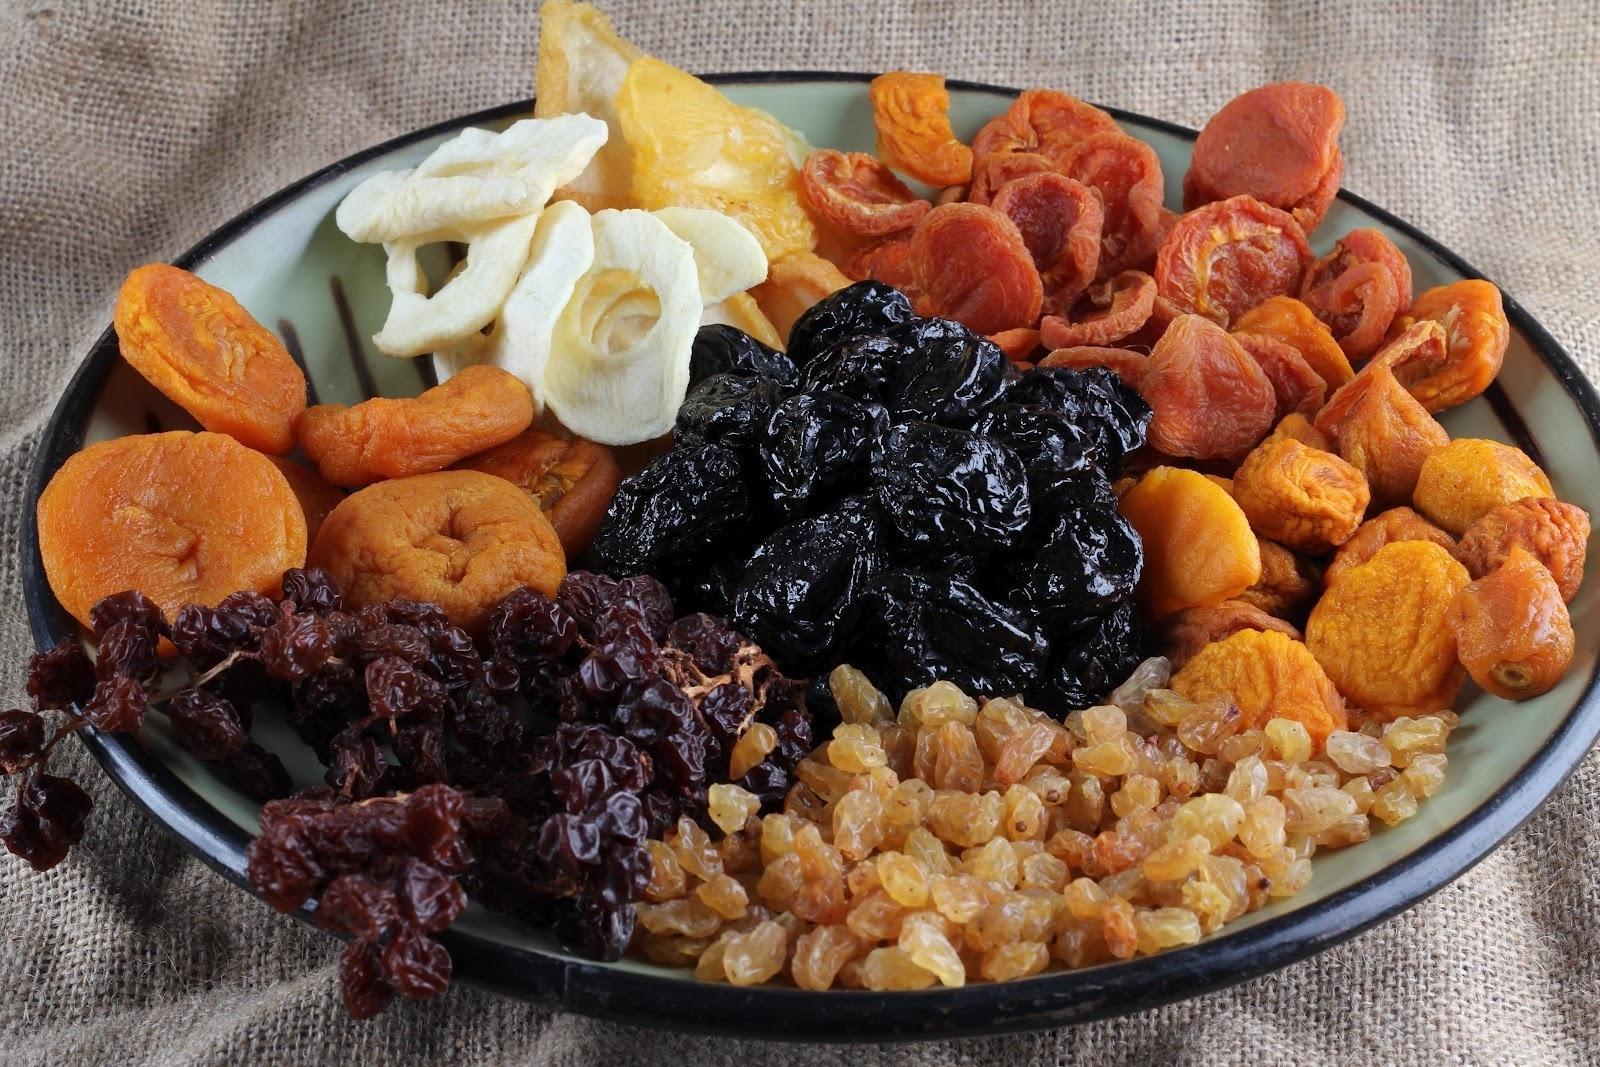 Saiba as Diferentes Propriedades Entre as Frutas e os Fruto Secos